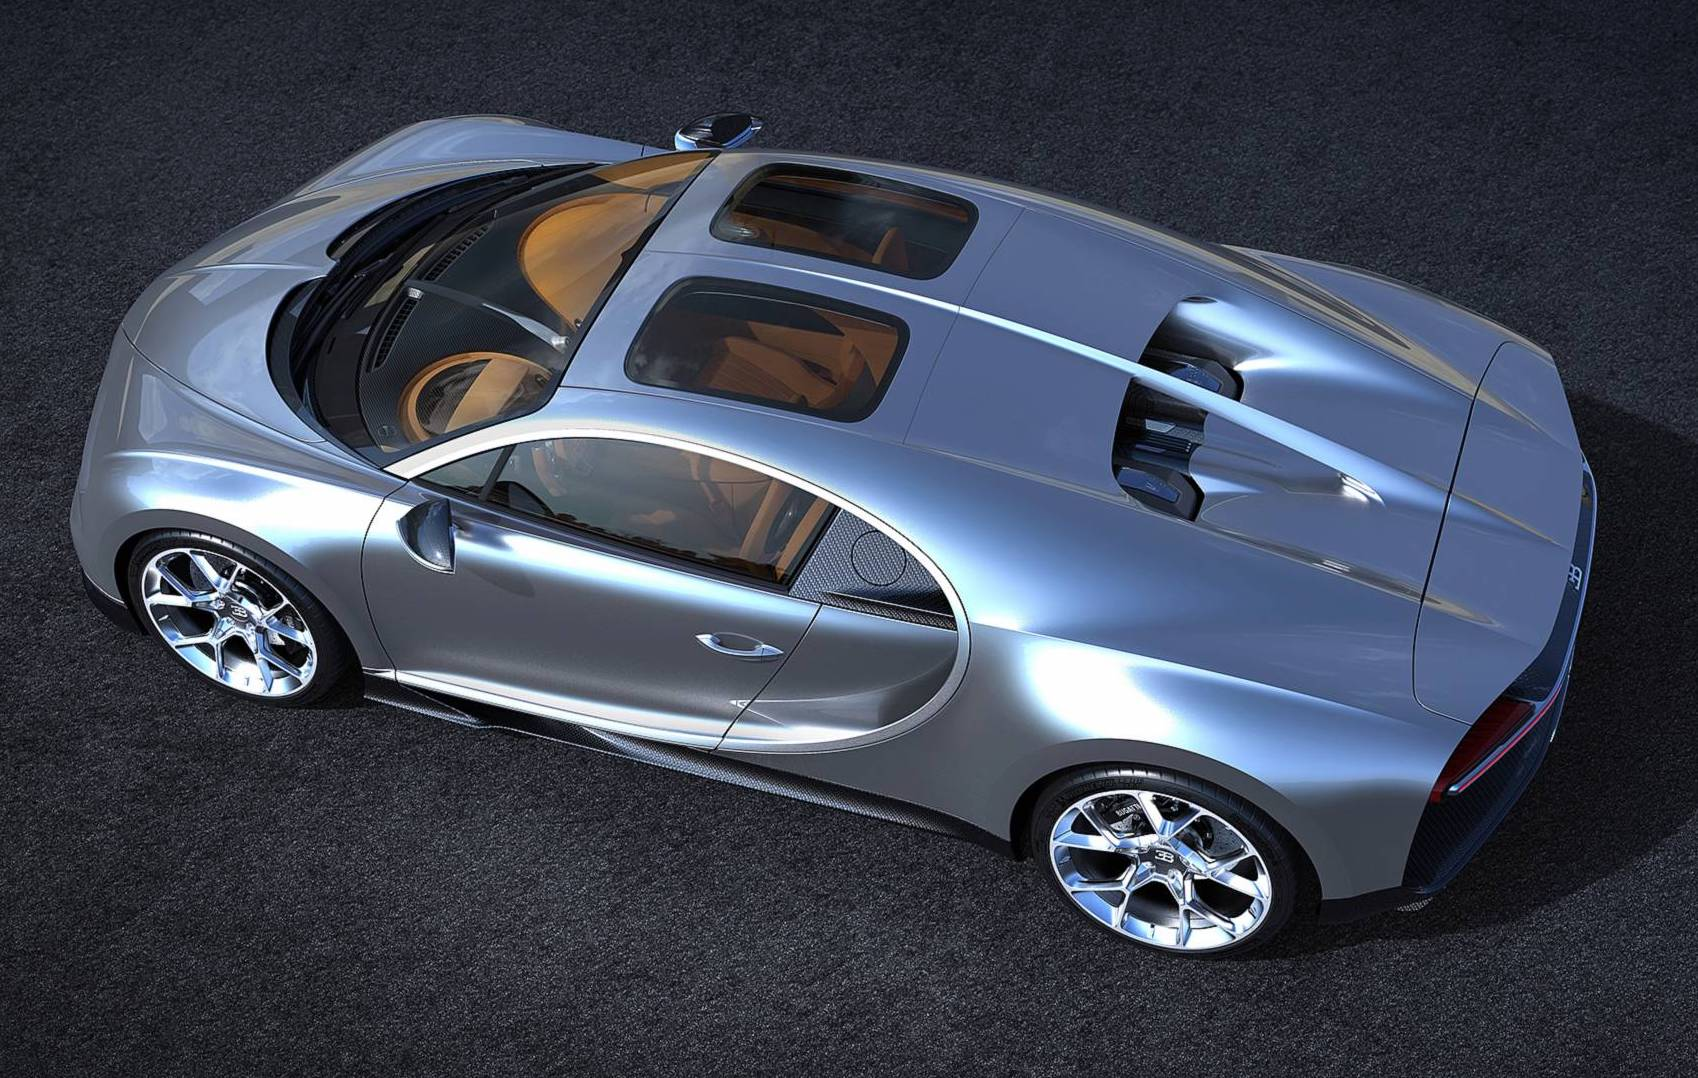 Bugatti Chiron Sky View Sunroof Option Announced